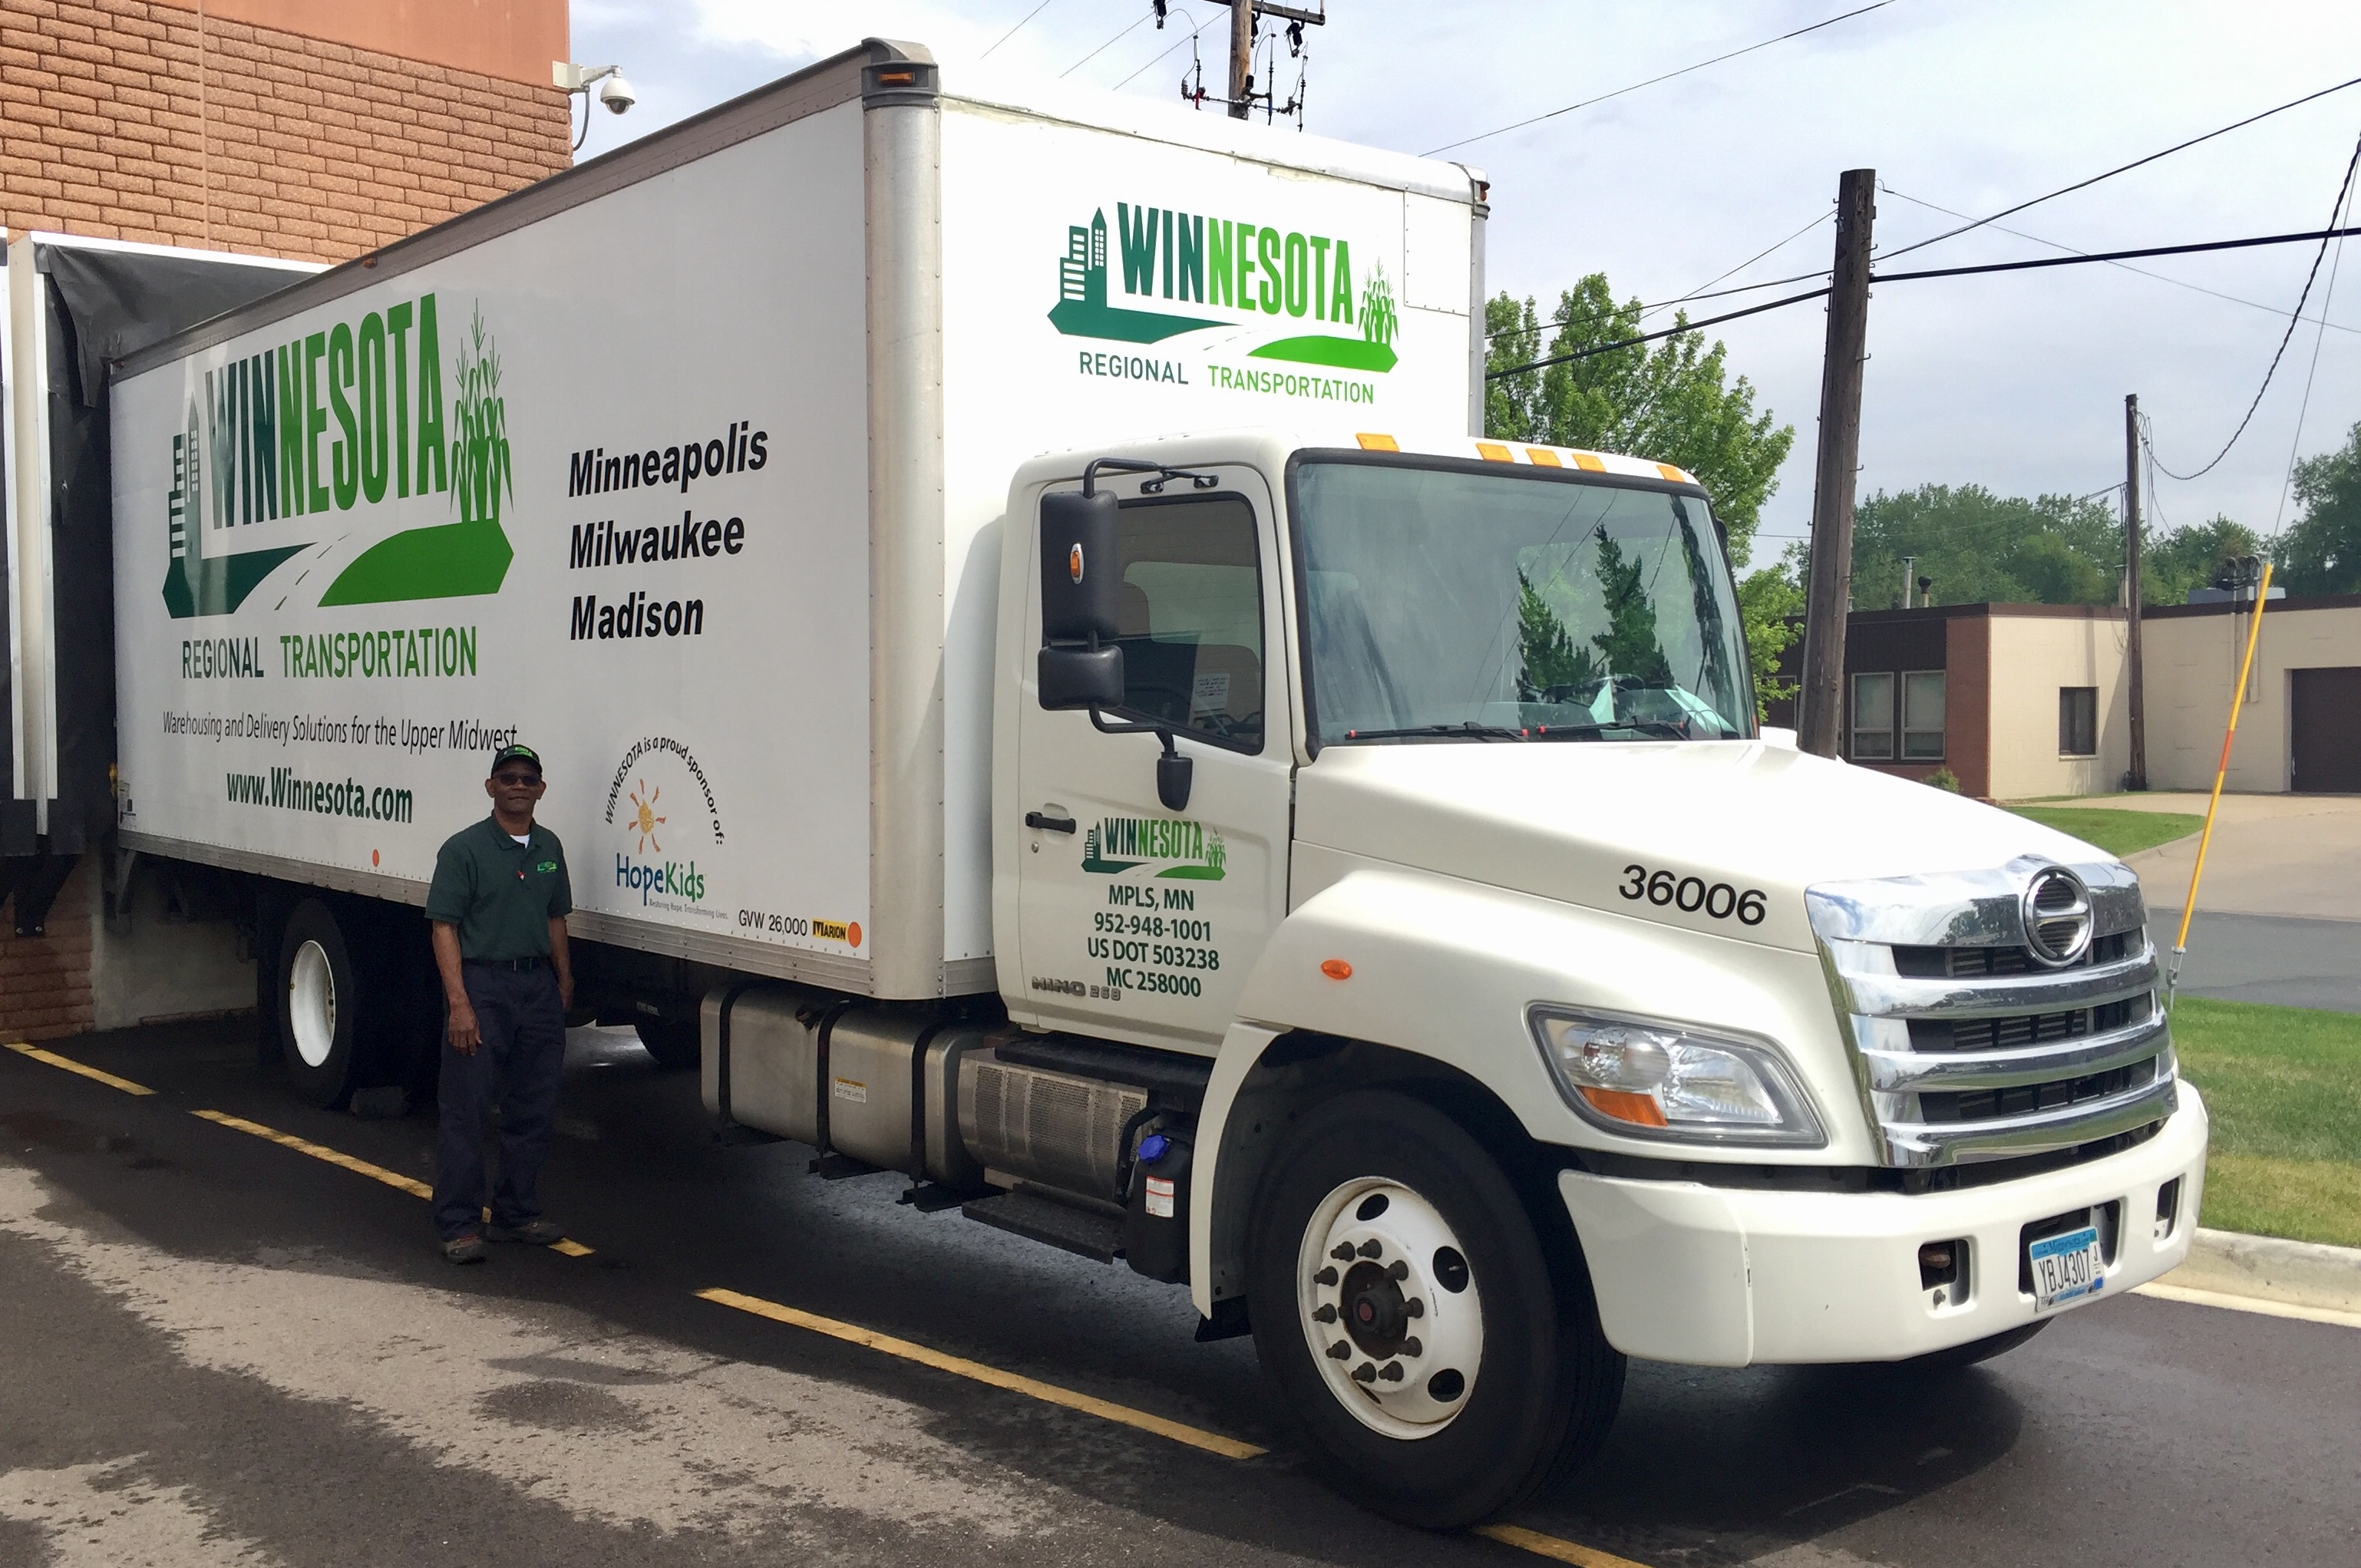 Winnesota Regional Transportation Truck